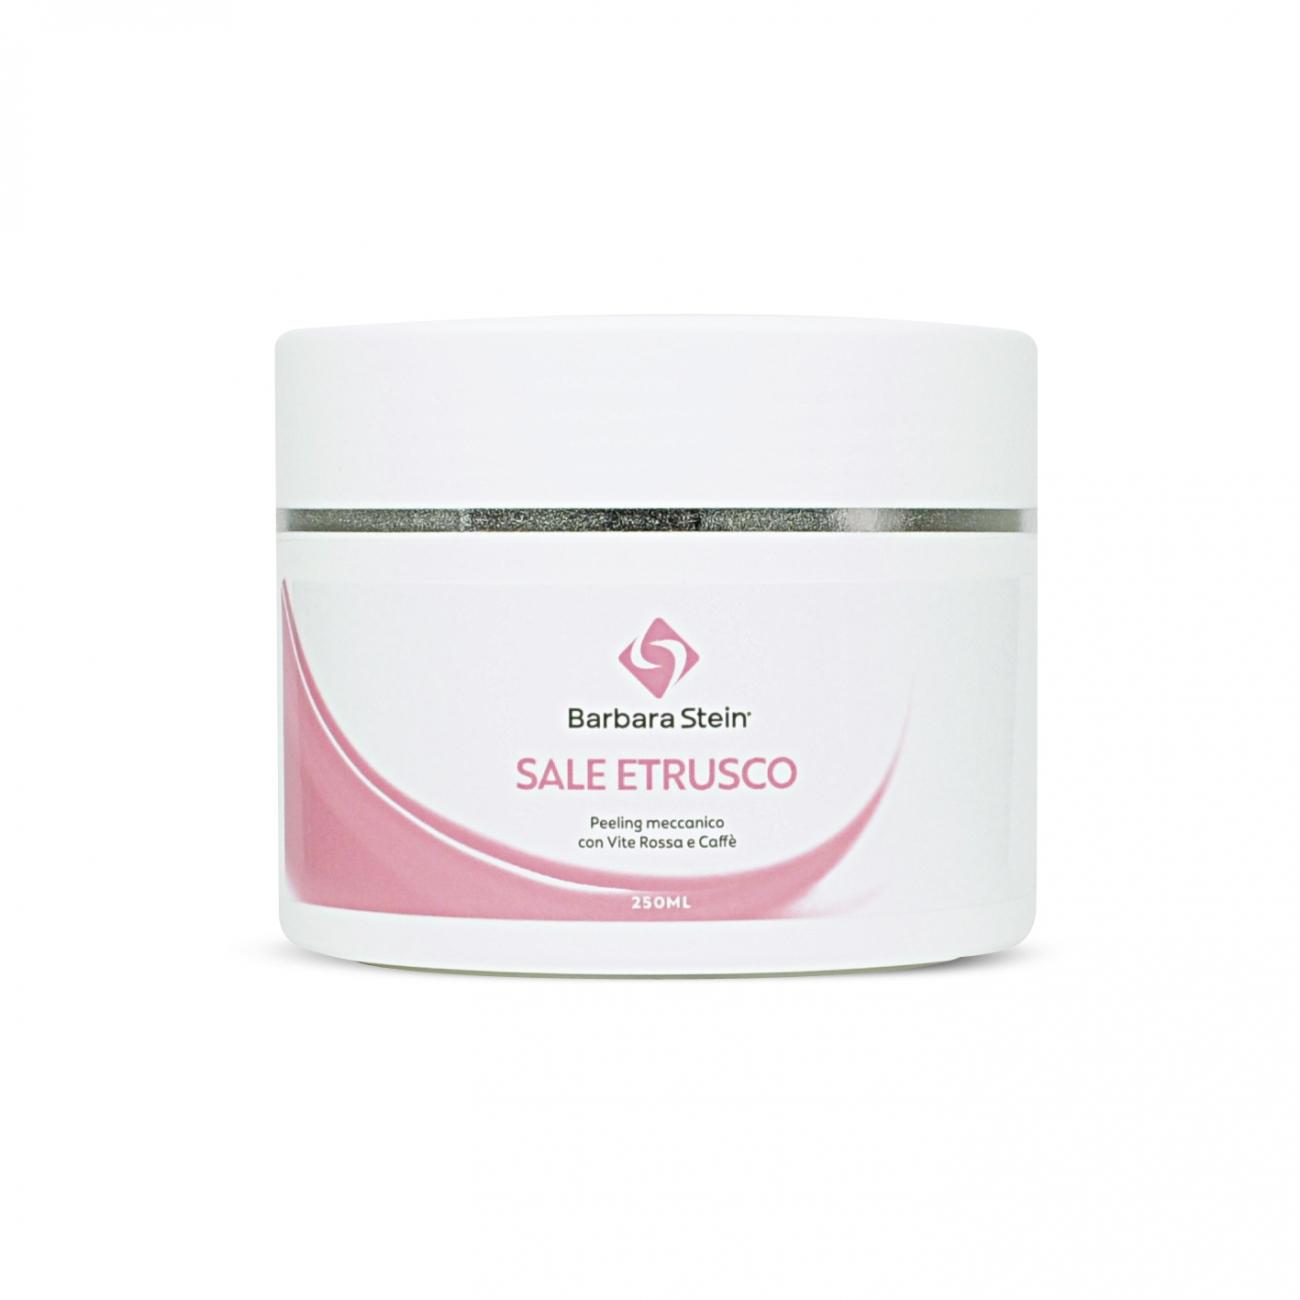 SALE ETRUSCO (250 ml)